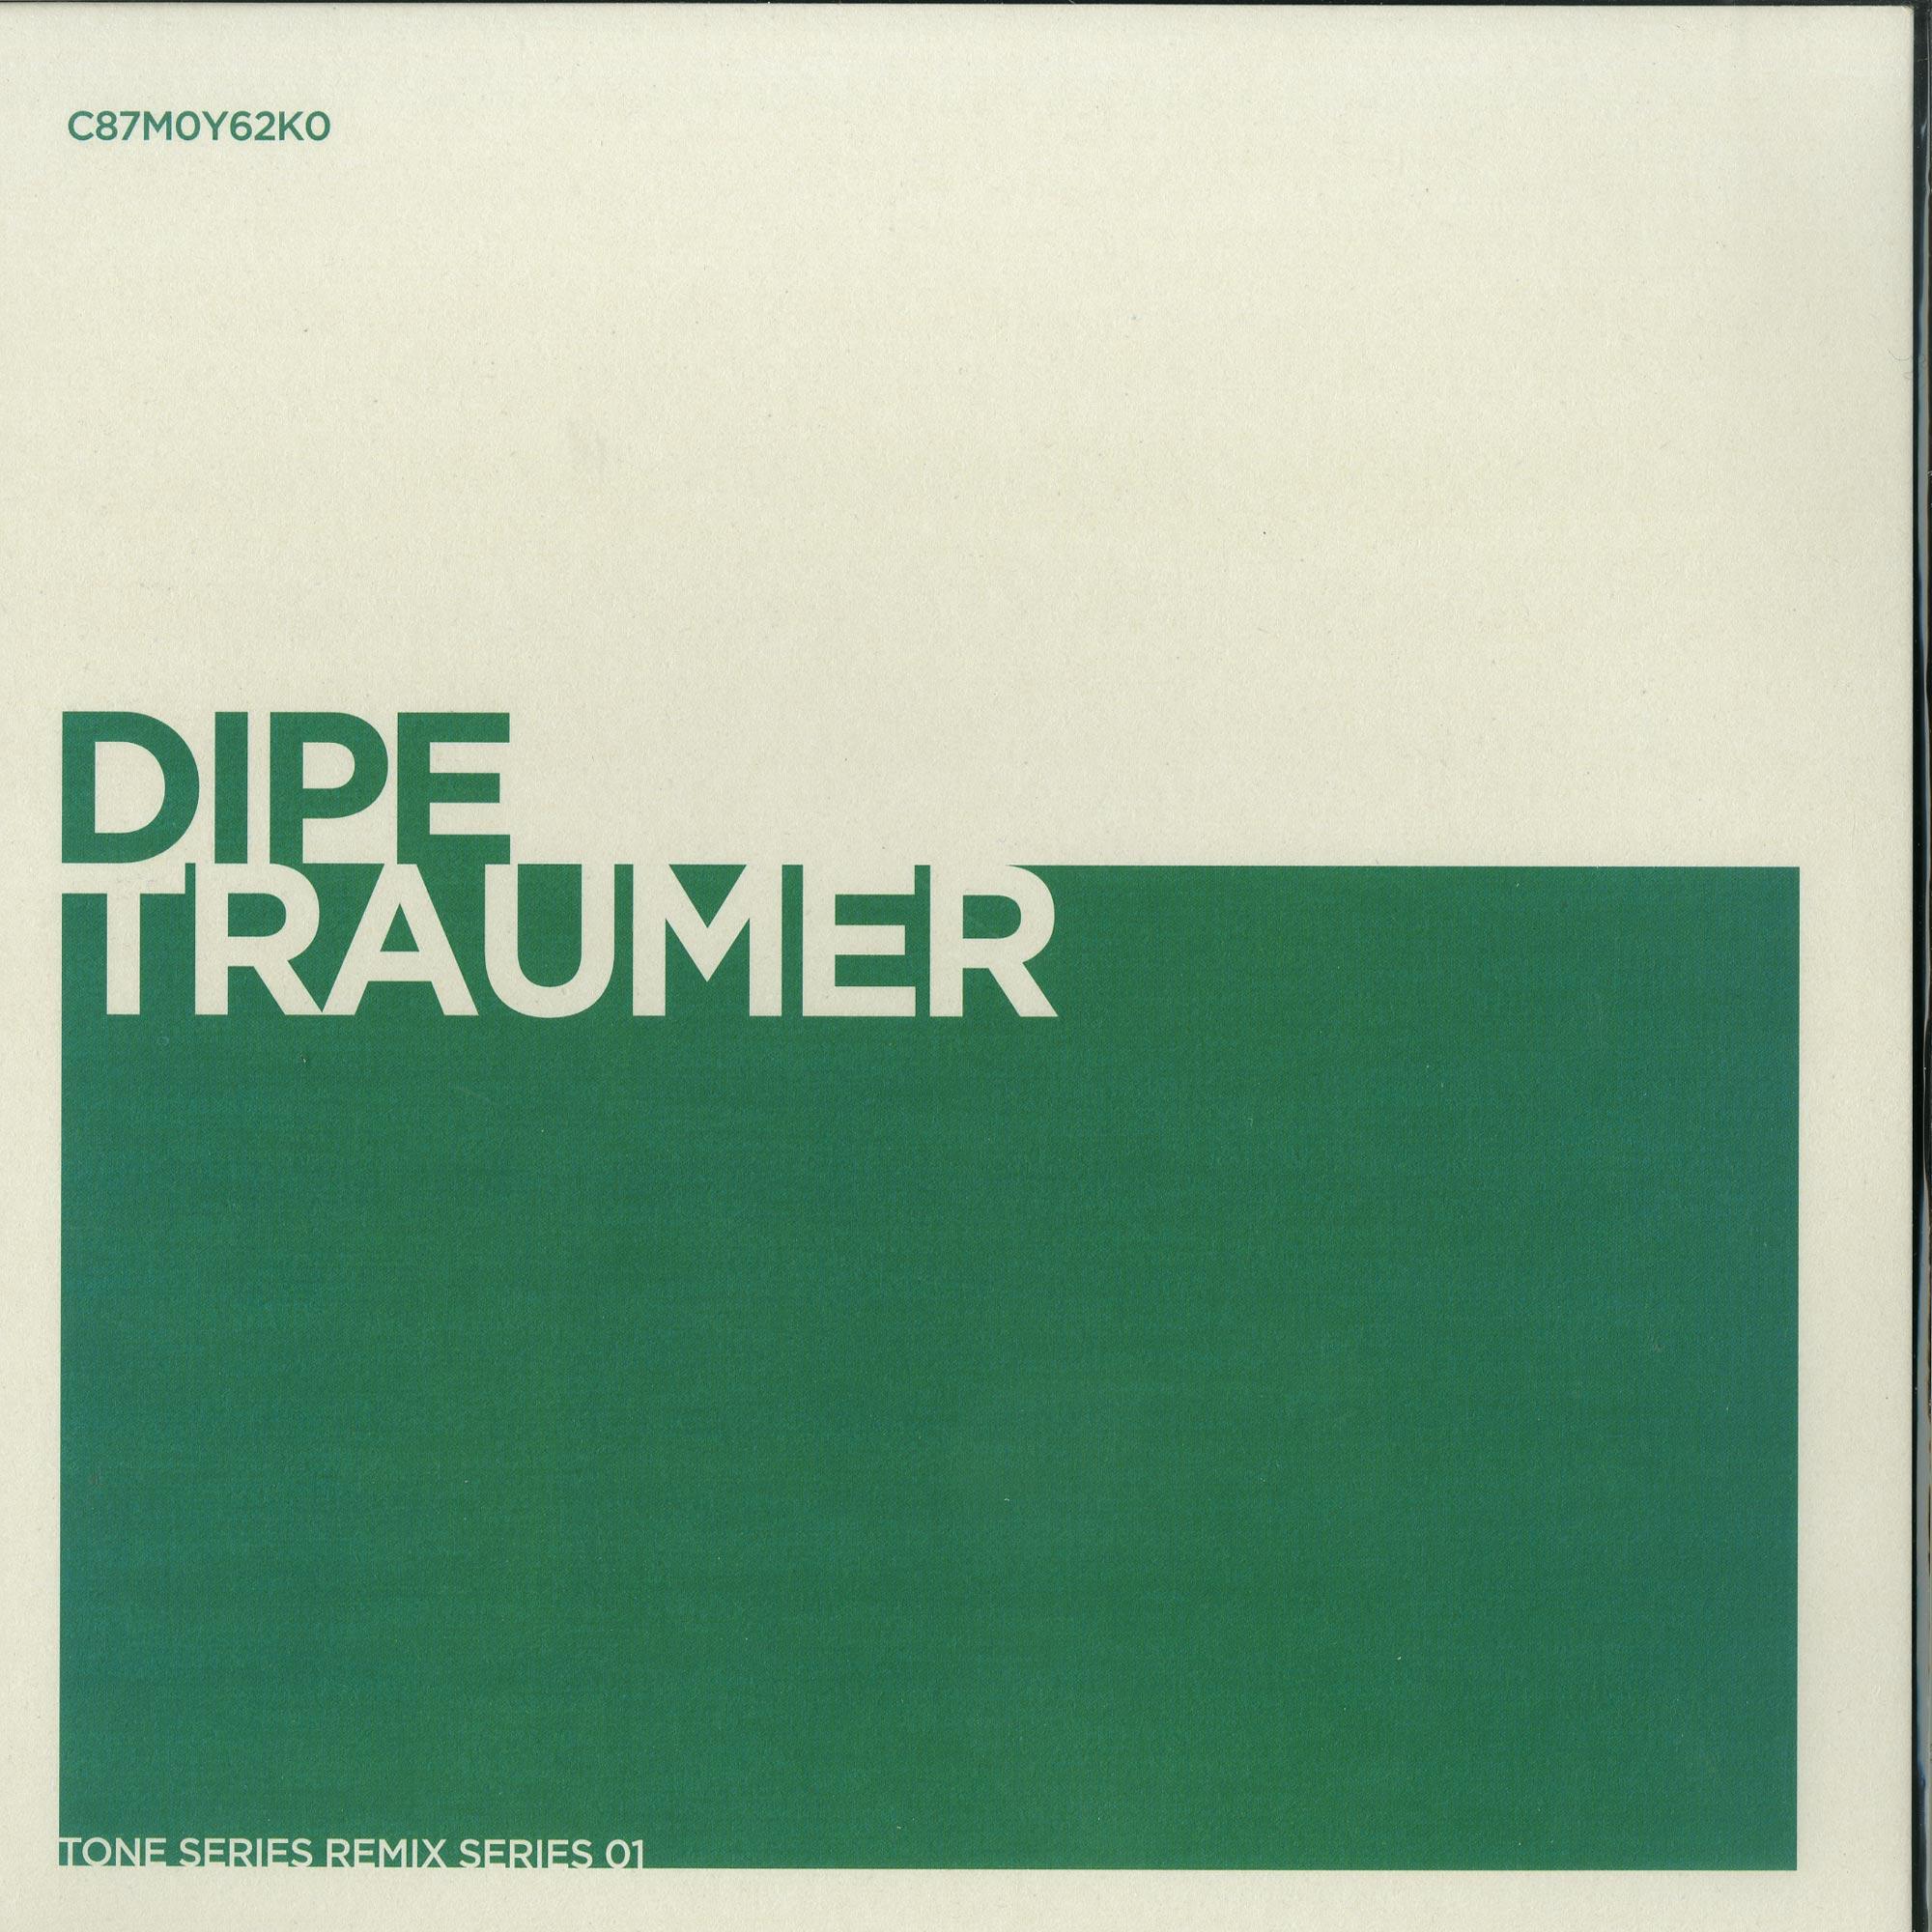 Tone Series - TRAUMER & TOMOKI TAMURA REMIXES